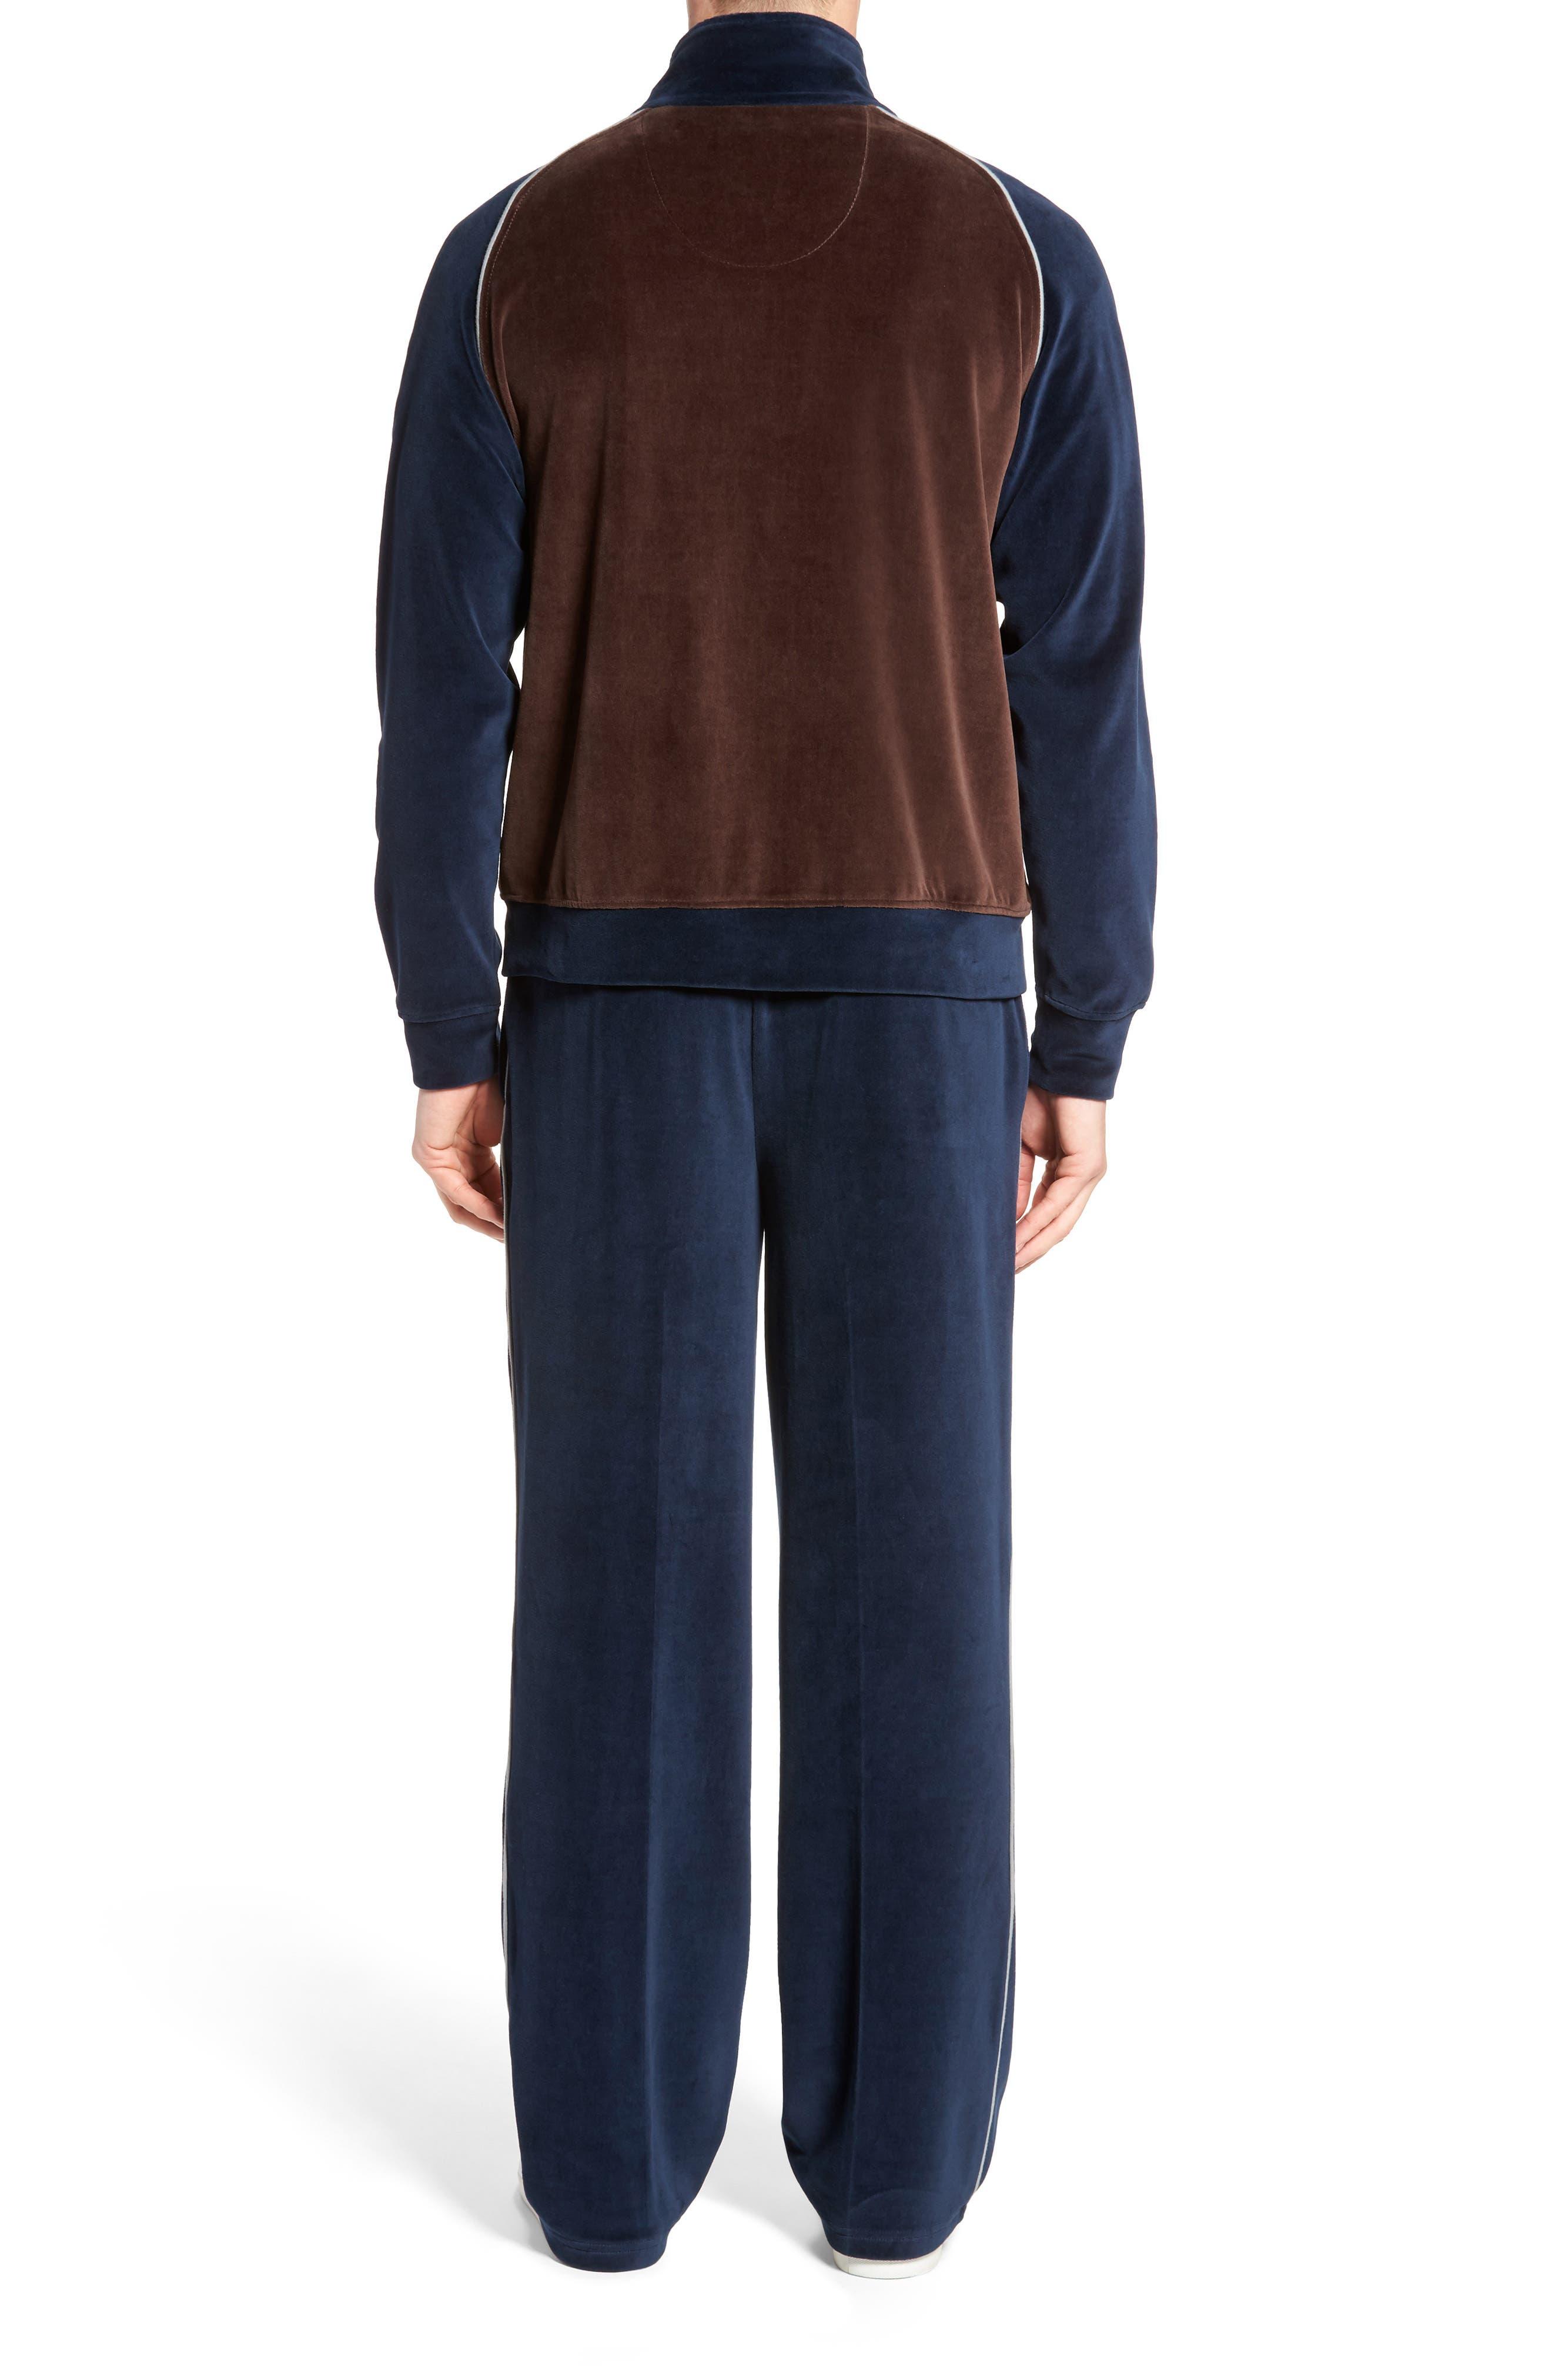 Strathcona Velour Warm-Up Suit,                             Alternate thumbnail 2, color,                             410